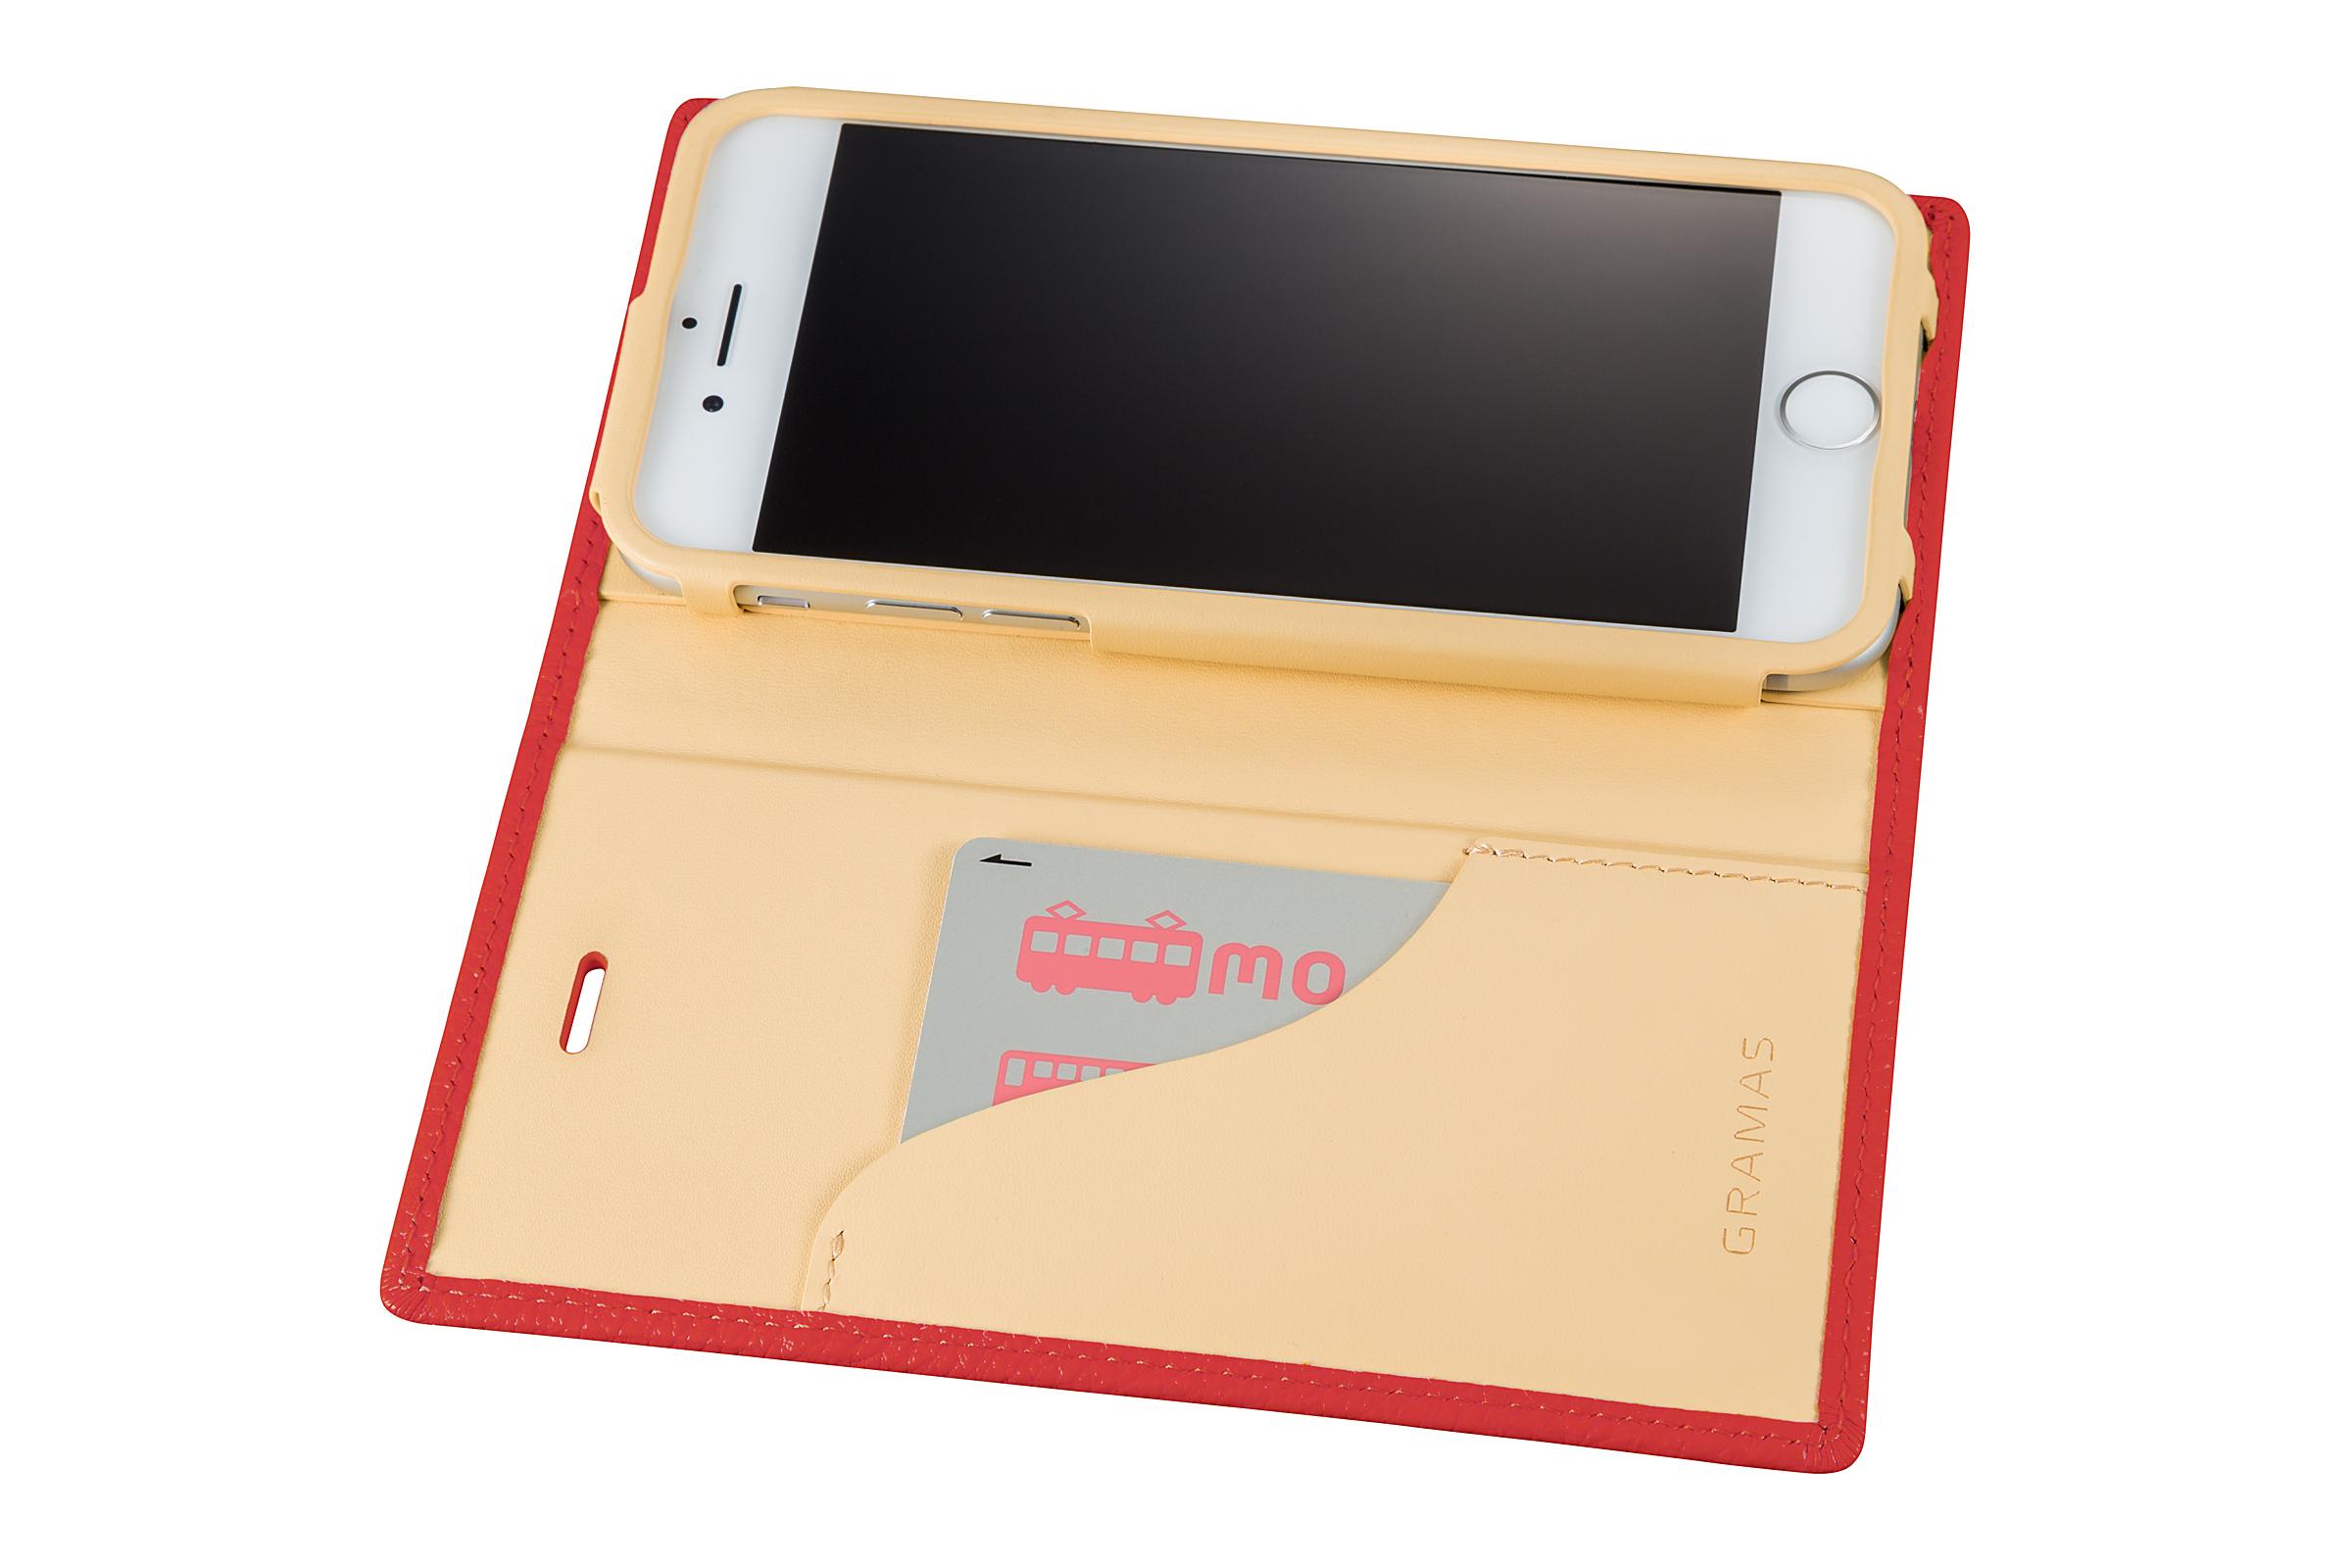 GRAMAS Shrunken-calf Full Leather Case for iPhone 7(Pink) シュランケンカーフ 手帳型フルレザーケース - 画像4